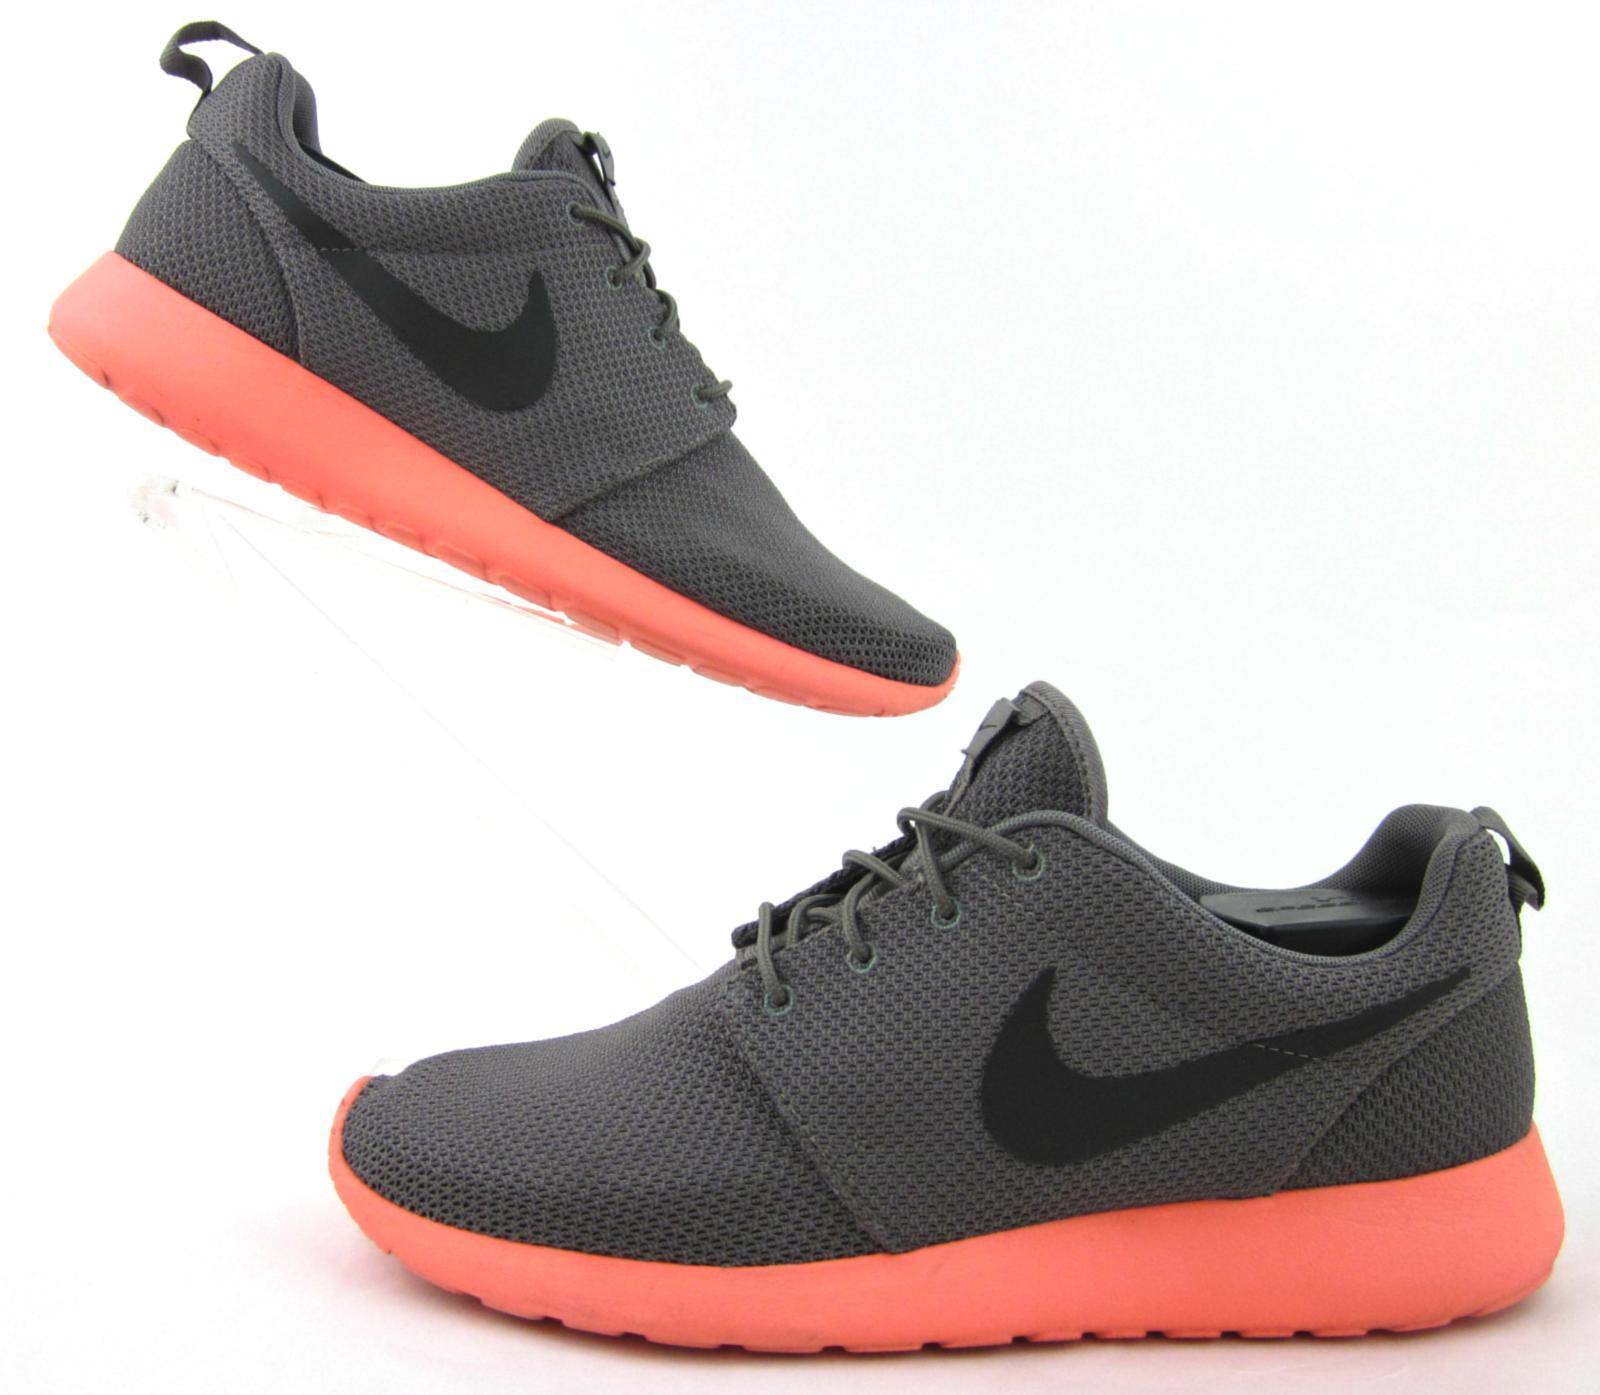 Nike Roshe Run Mango Soft Grey   Total Crimson US 11 [511881-096]